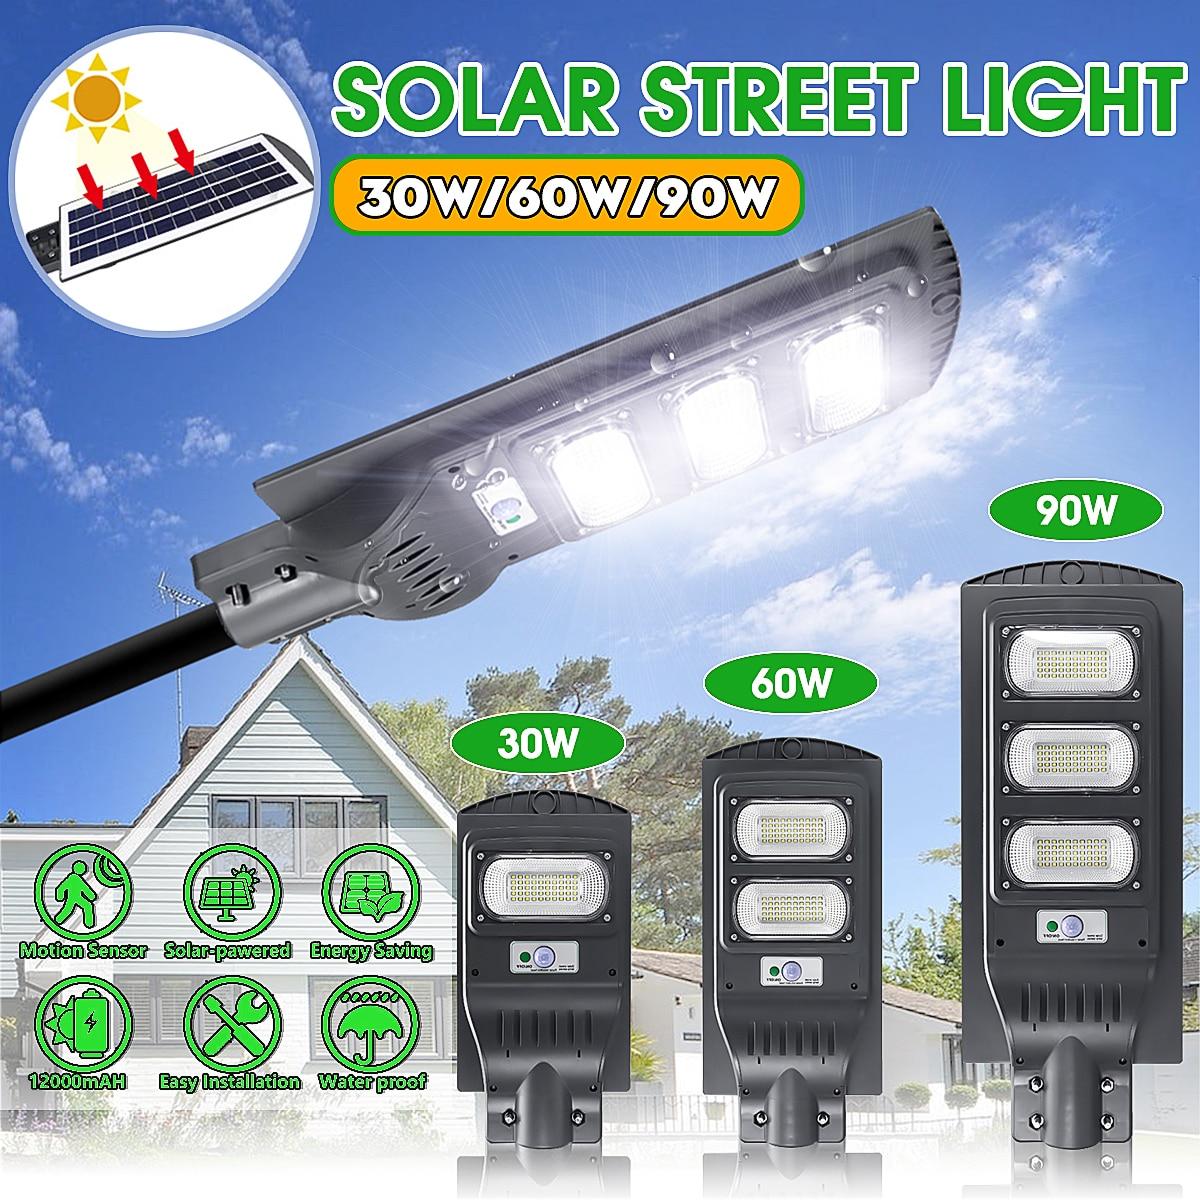 30//60//90W LED Solar Street Light Radar PIR Motion Sensor Wall Timing Lamp+Remote